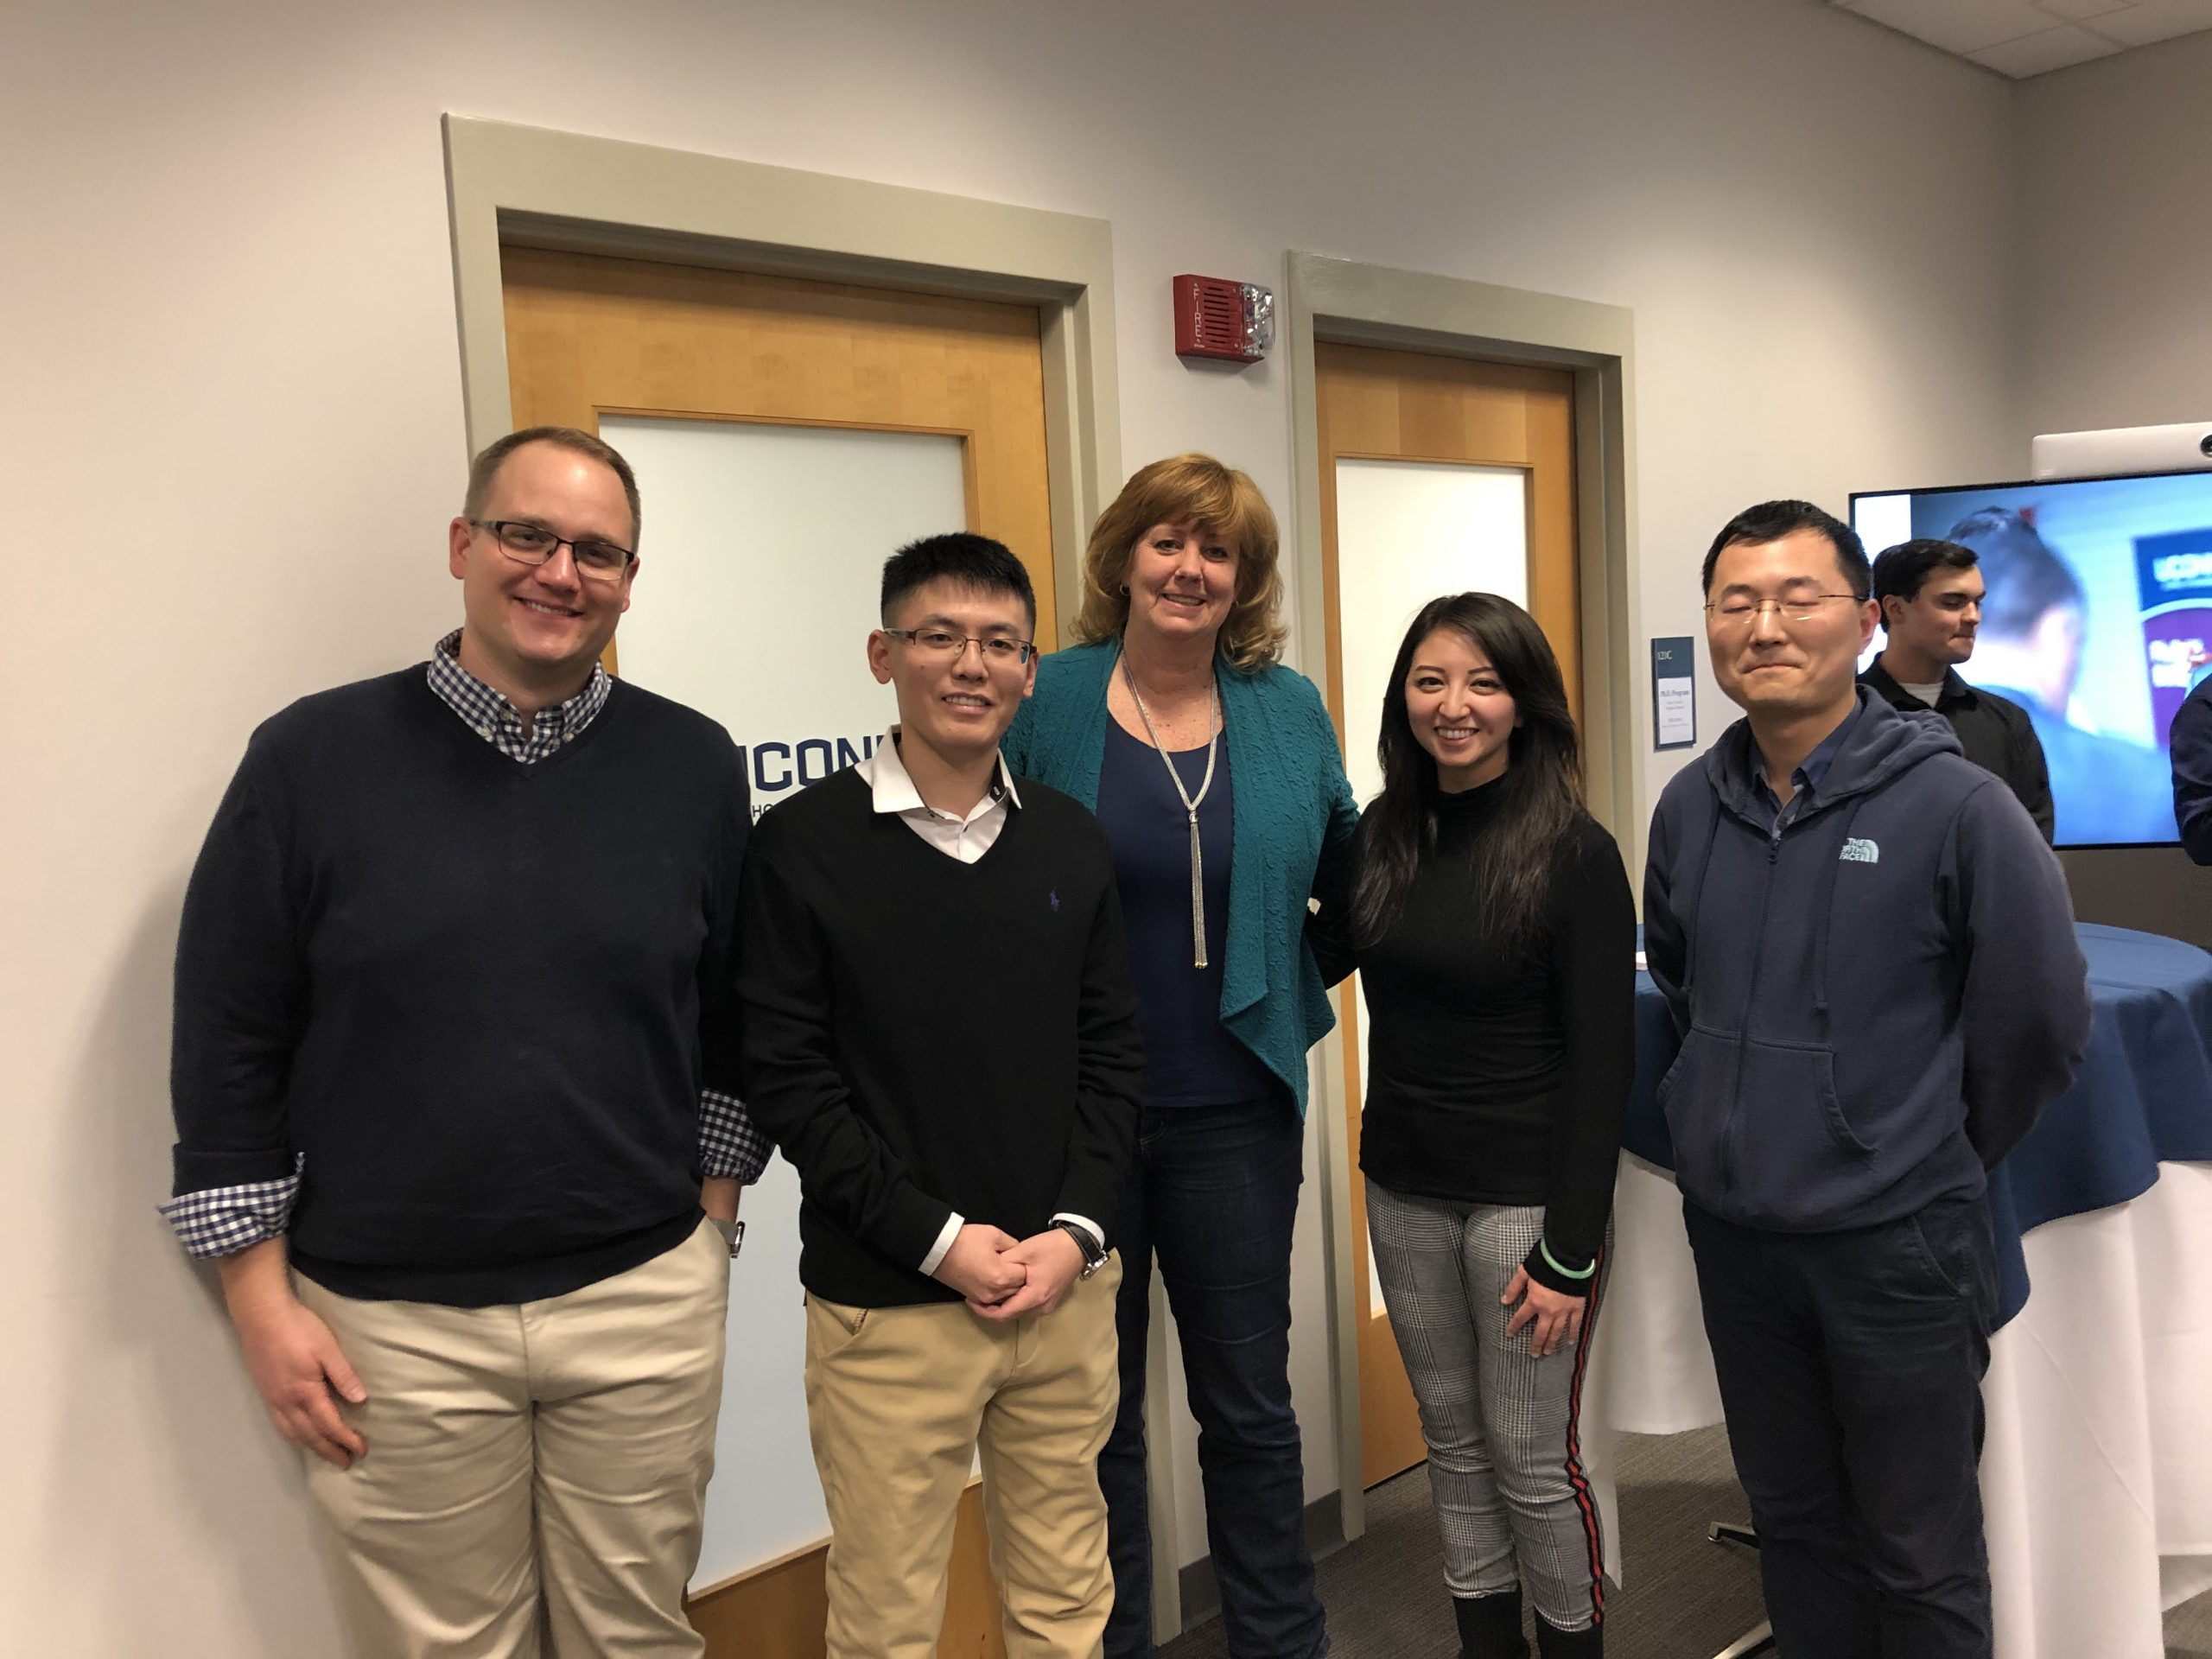 left to right: Trent Krupa (ACCT), Hongfei Li (OPIM), Associate Dean Lucy Gilson, Monique Domingo (MGMT), Luchun Ma (FNCE)